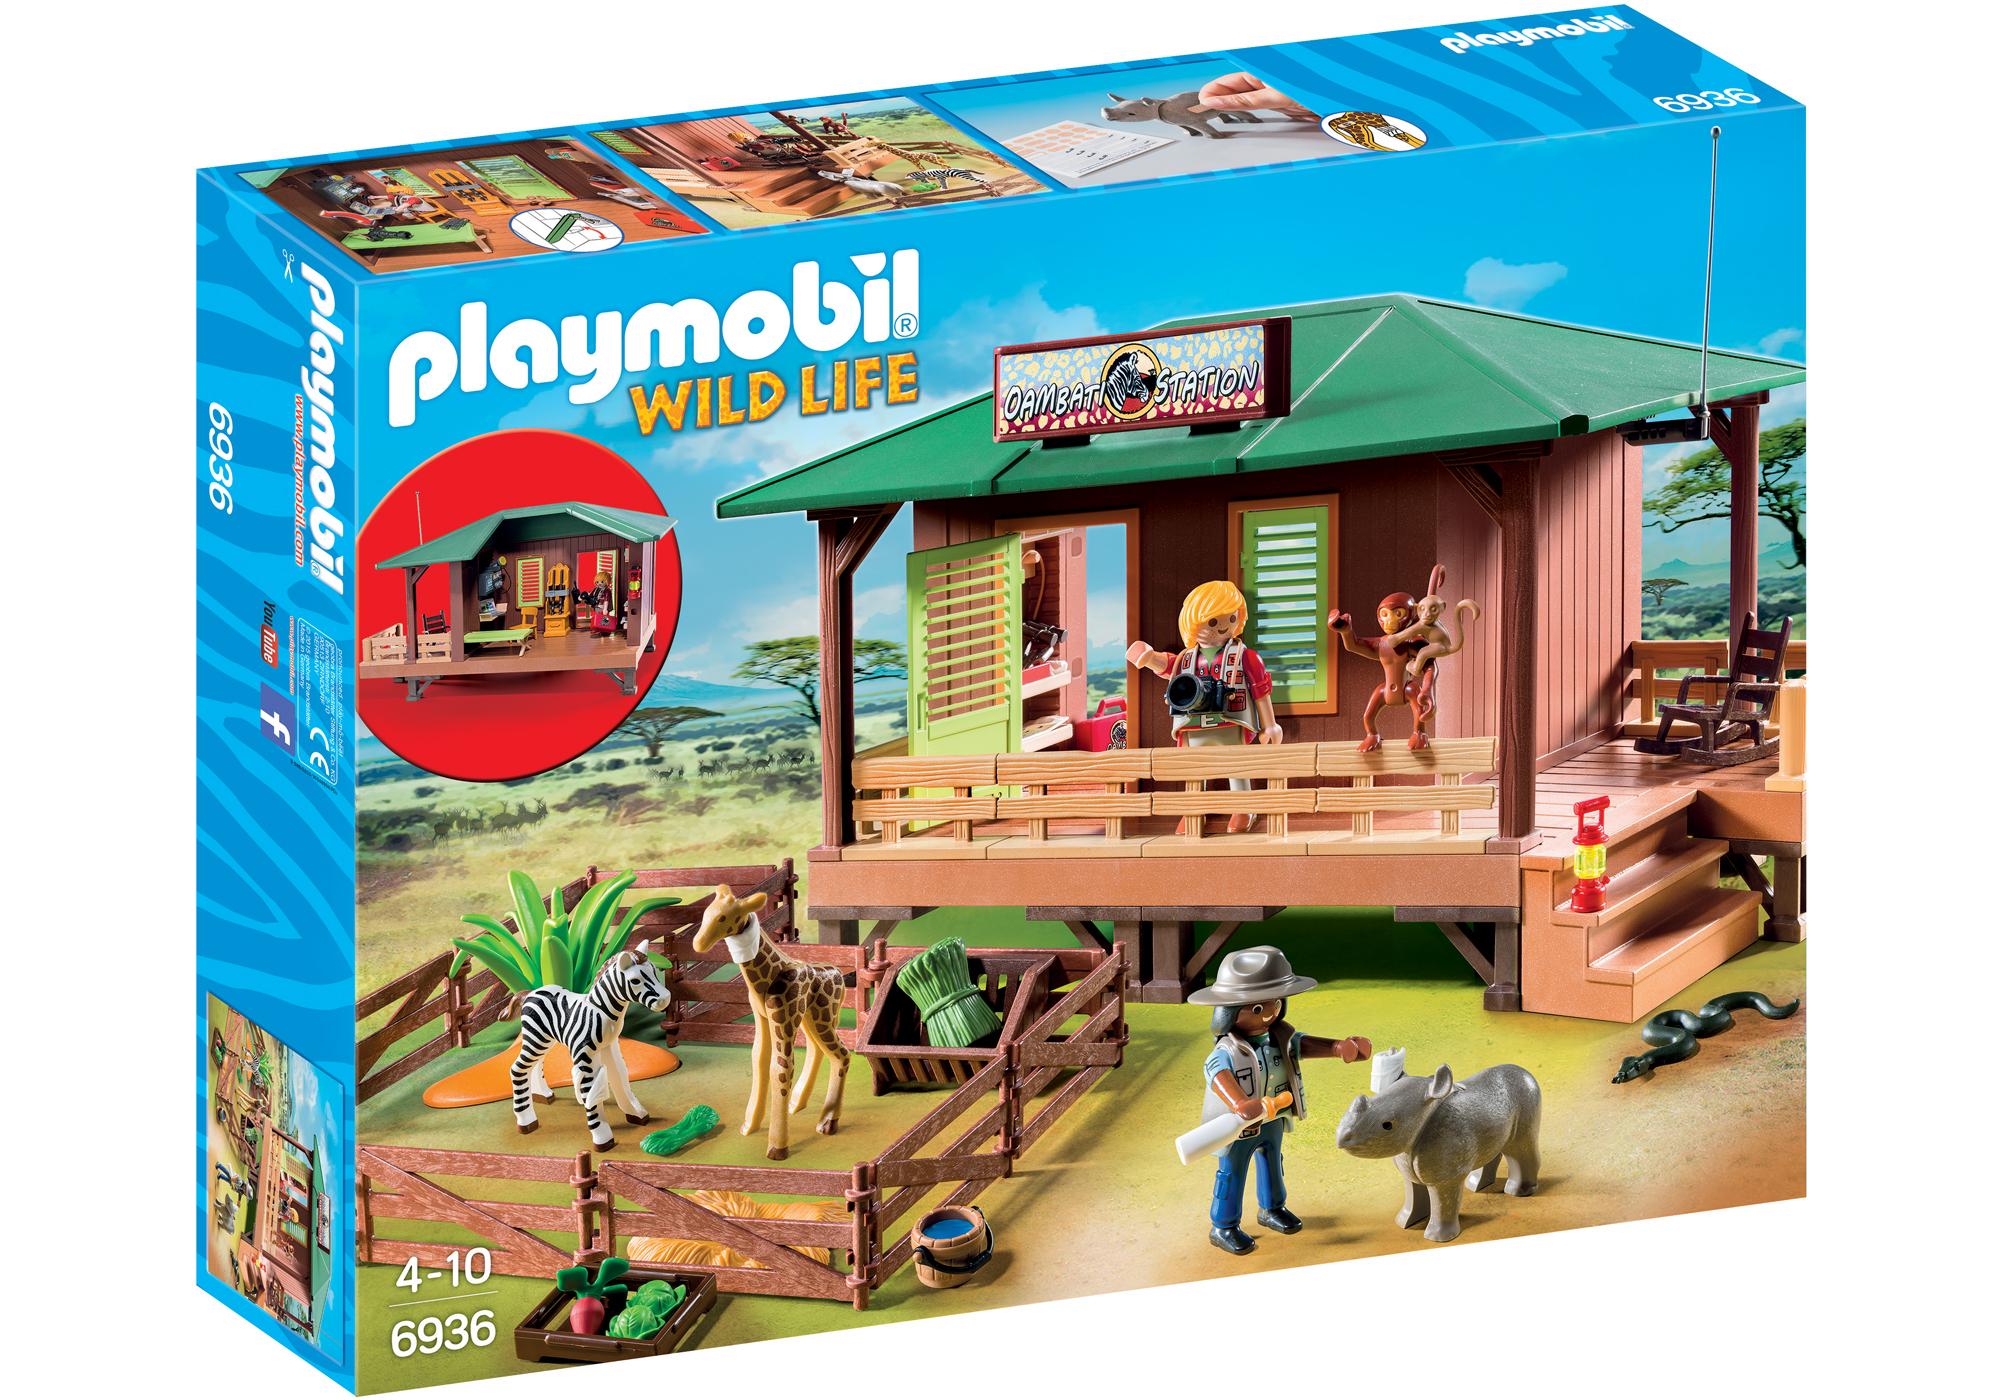 http://media.playmobil.com/i/playmobil/6936_product_box_front